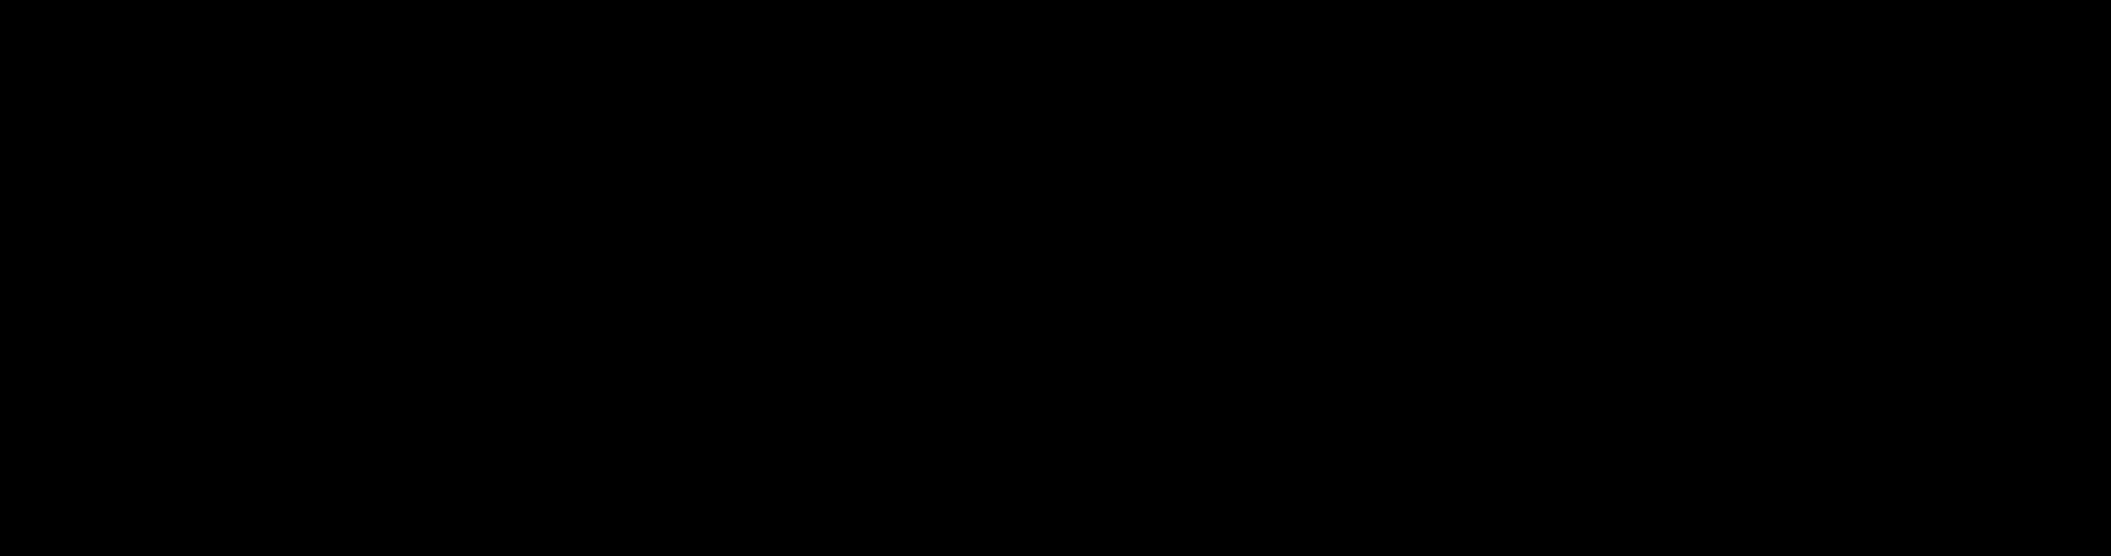 NEX-RegReporting-byAbide-Pos11